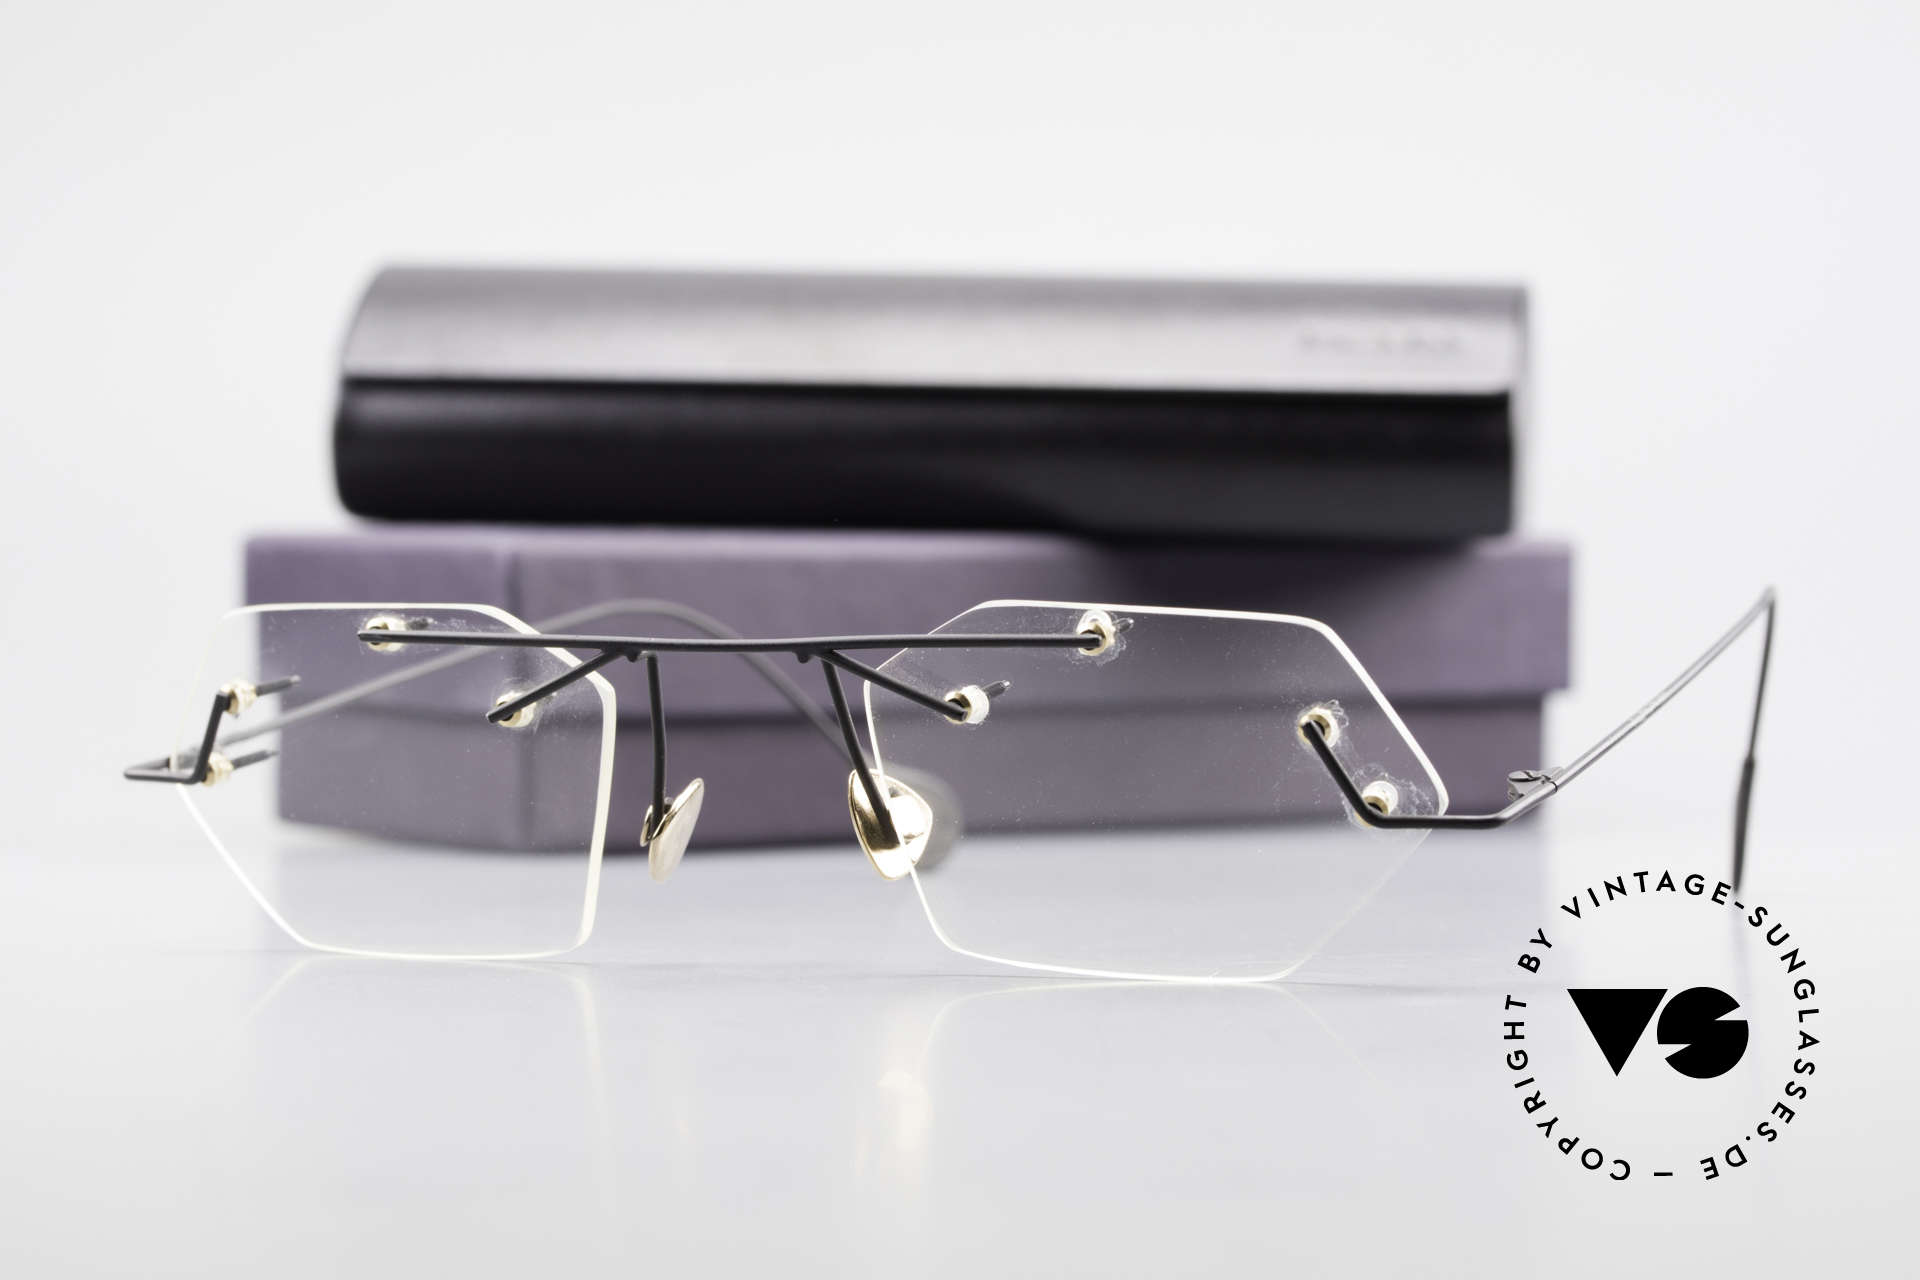 Paul Chiol 1998 Artful Rimless Eyeglasses 90's, Size: medium, Made for Men and Women